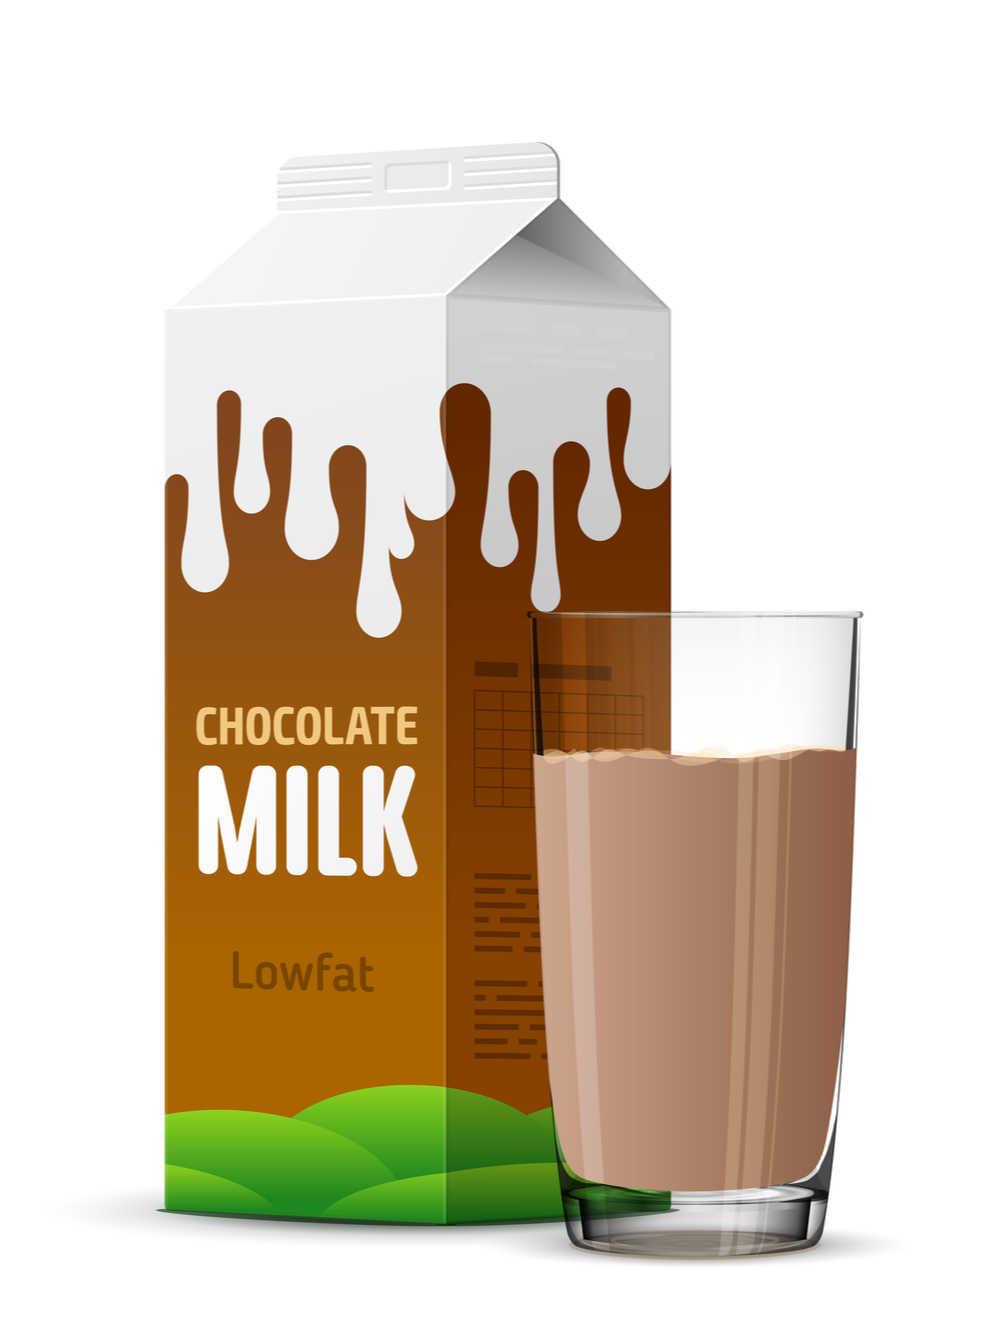 A cartoon style carton of lowfat chocolate milk beside a glass of chocolate milk.